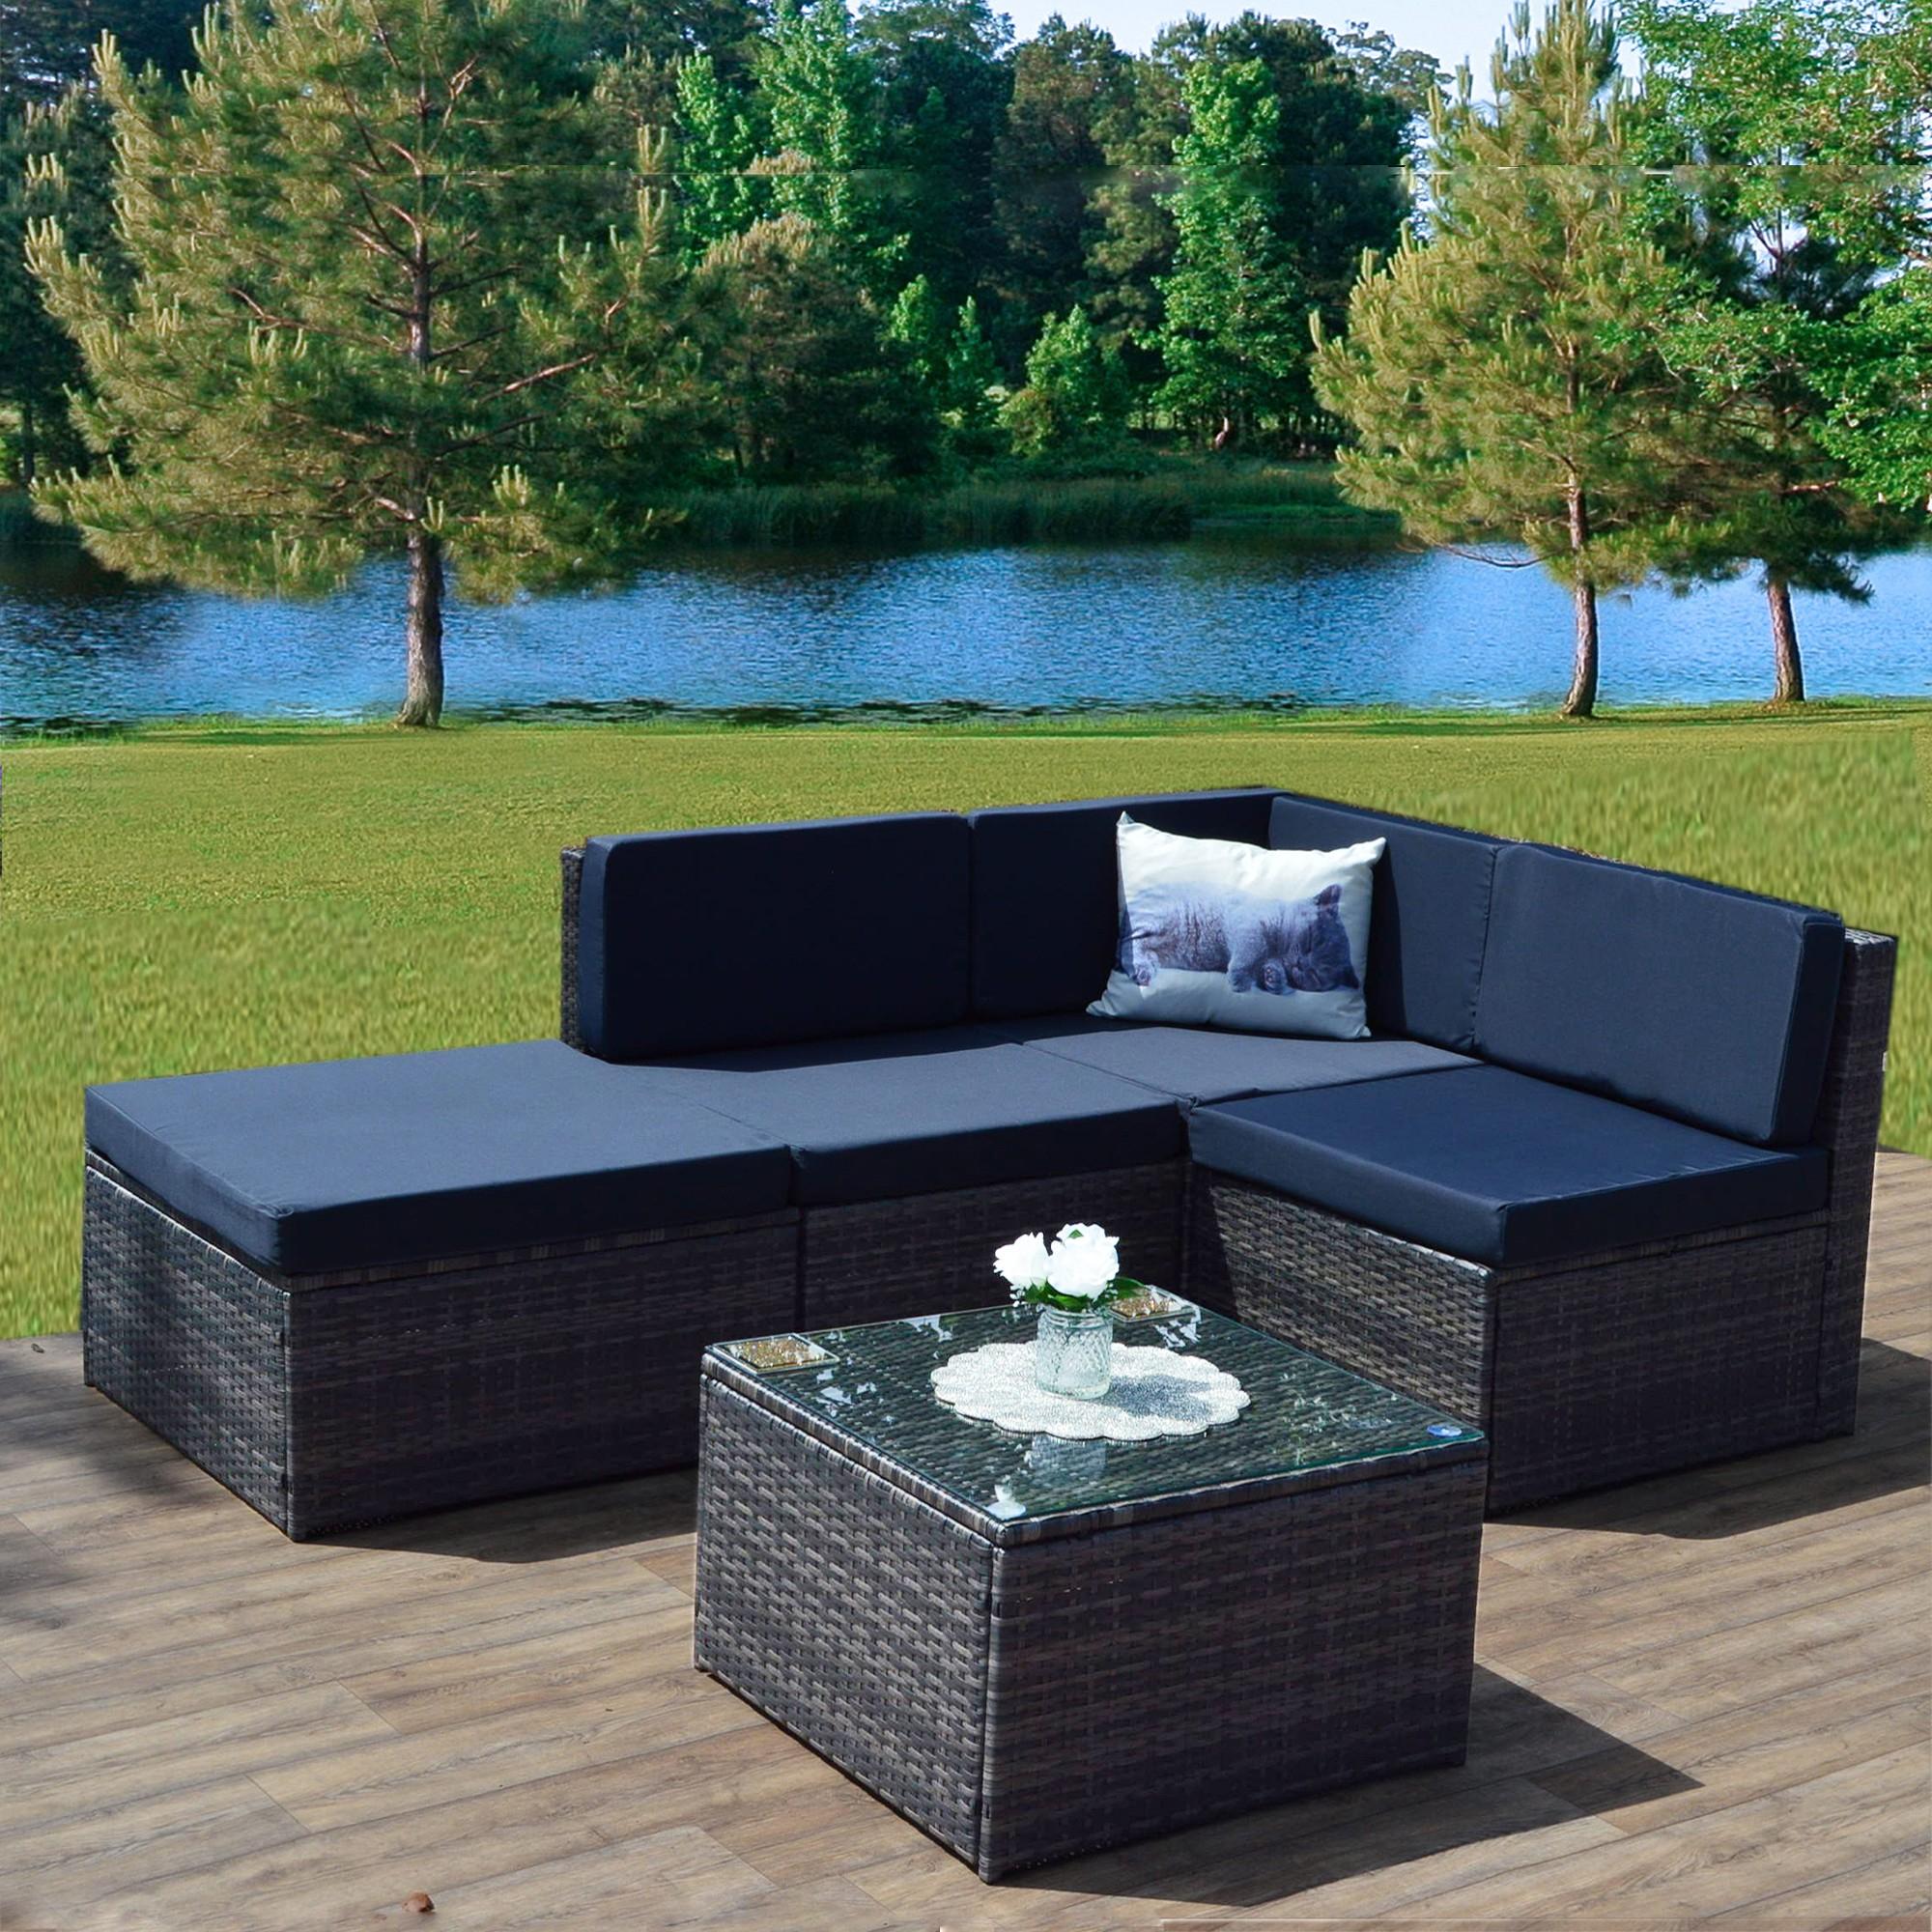 Aldi Patio Furniture Elegant Garden Furniture 2015 Uk Interior inside sizing 2000 X 2000